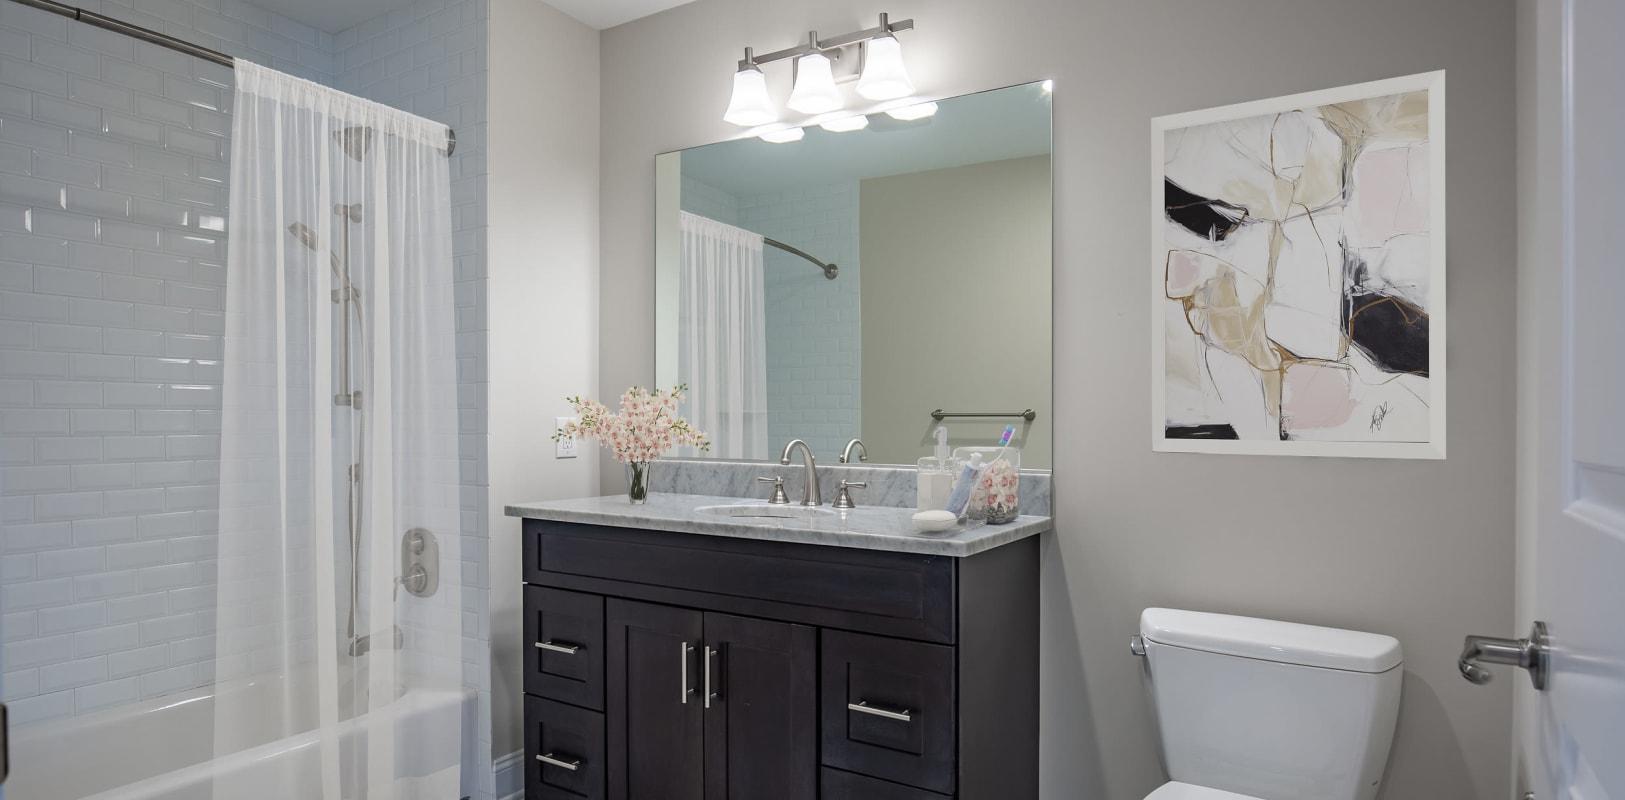 Modern bathroom with black vanity at Zephyr Ridge in Cedar Grove, New Jersey